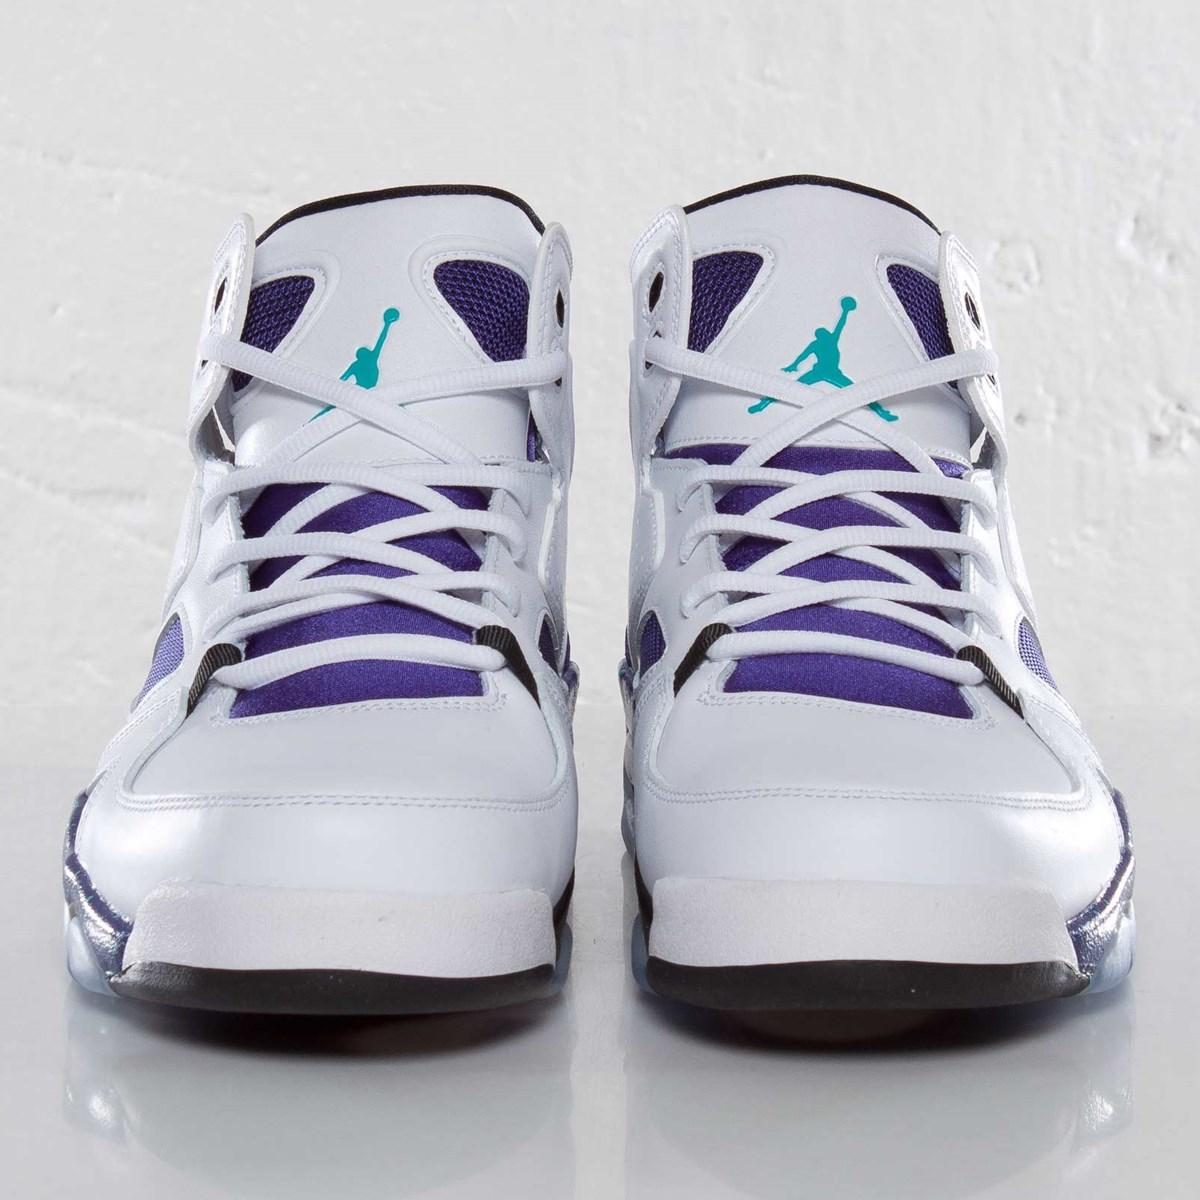 fbe32913a17168 Jordan Brand Jordan Flight Club ´91 - 555475-108 - Sneakersnstuff ...